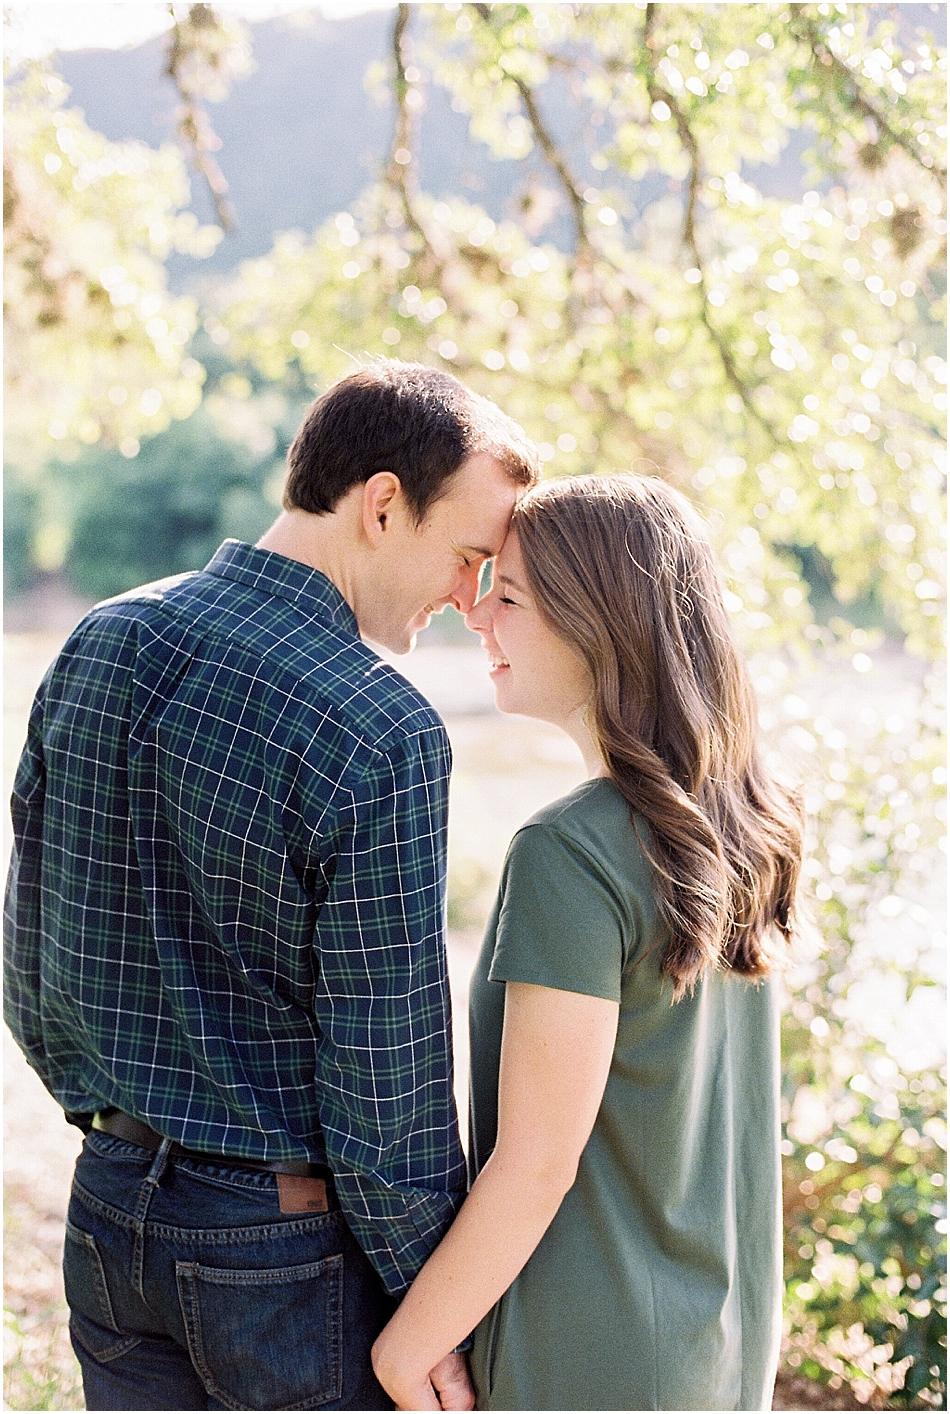 Laura + Nick | Engagement | Fine Art Film | Austin Texas | Emilie Anne Photography-7.jpg